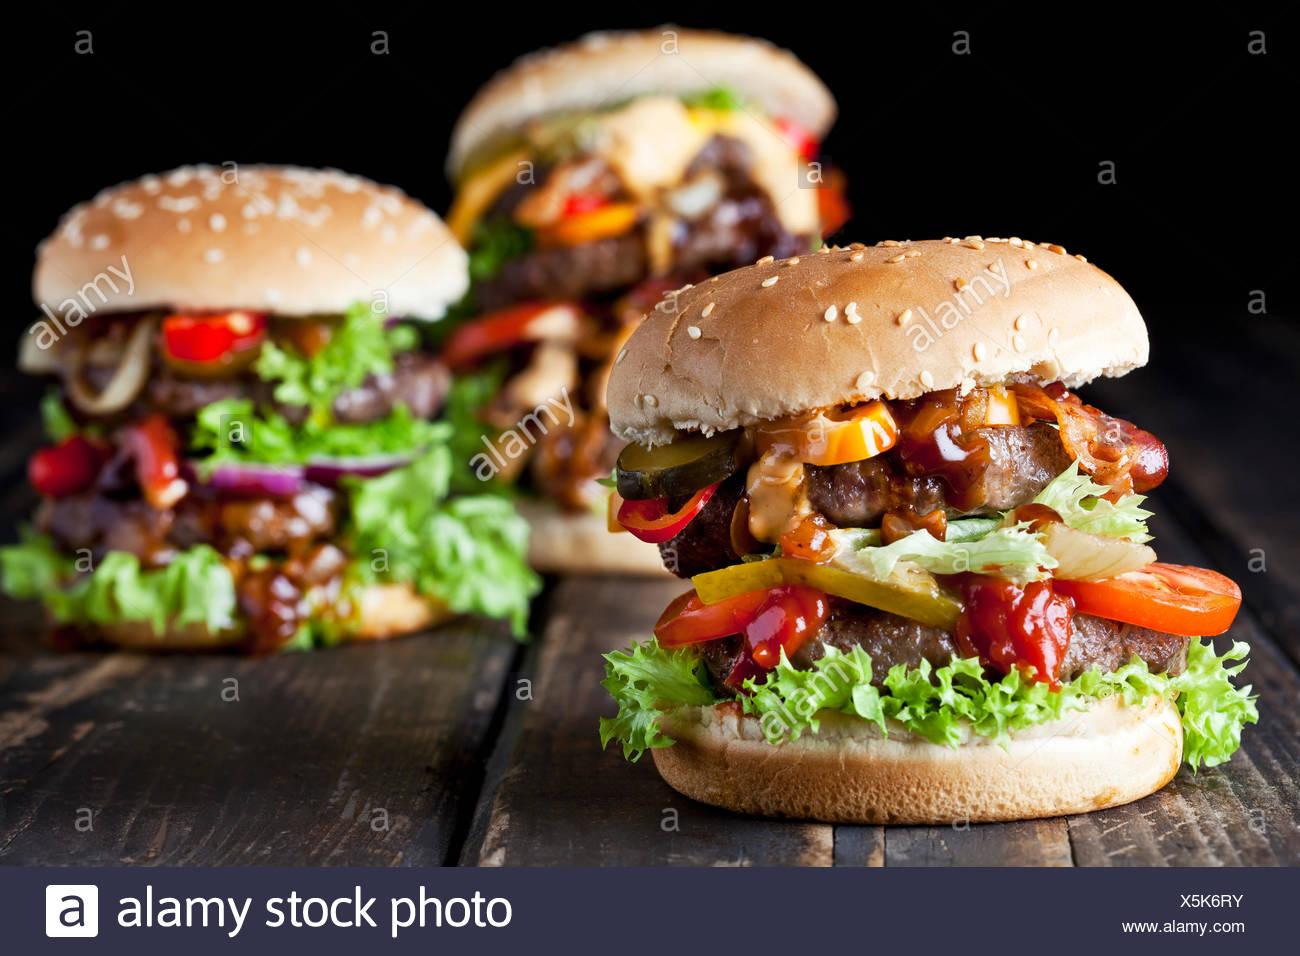 Three double burgers - Stock Image